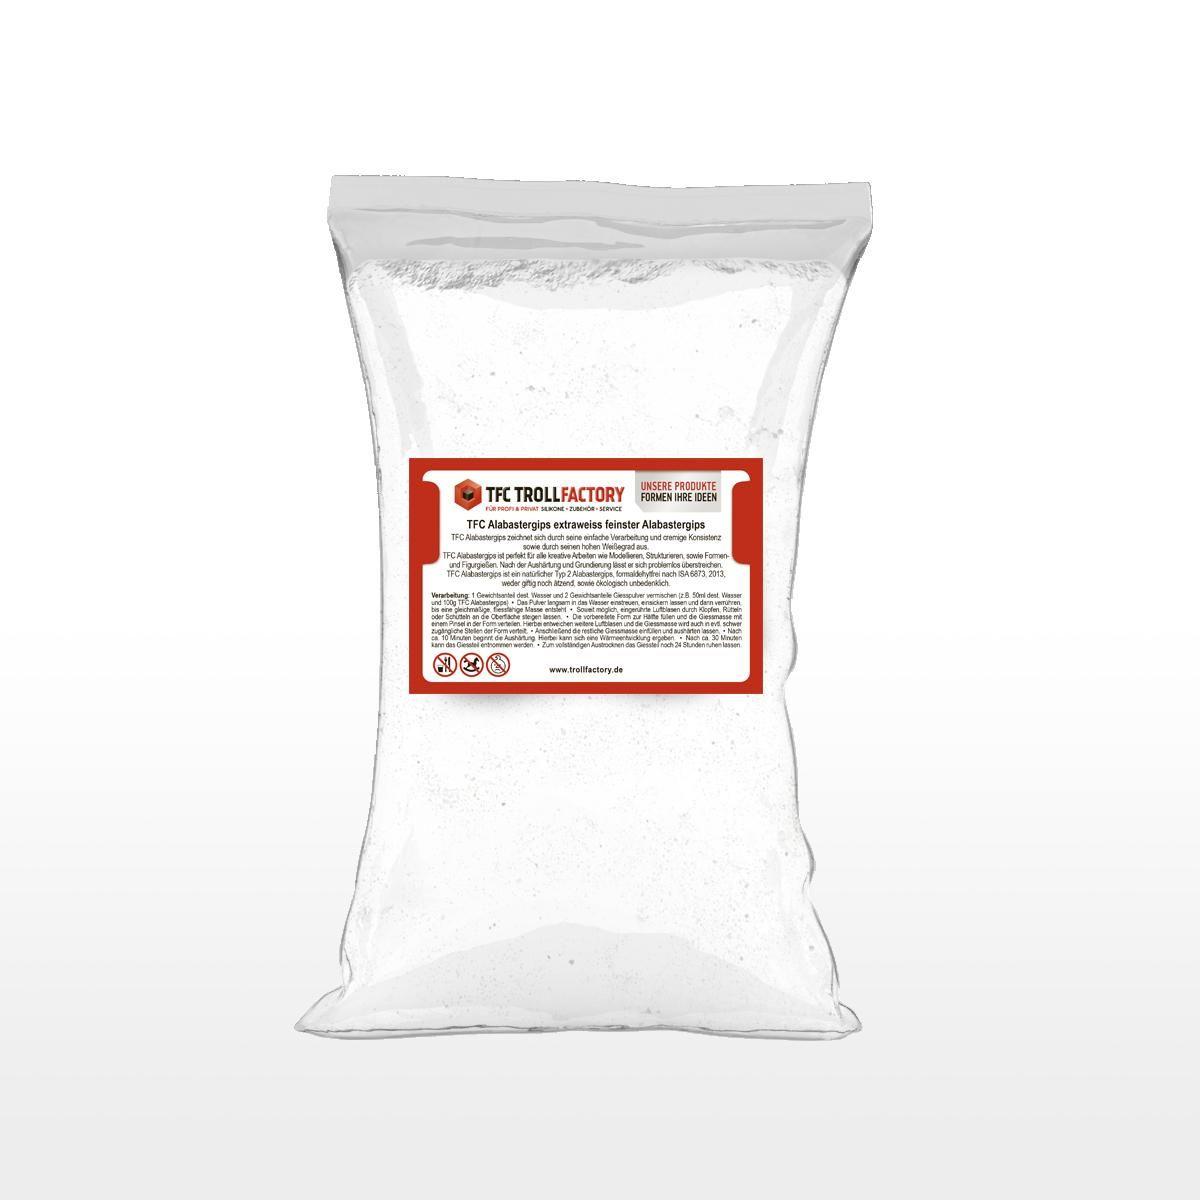 TFC Alabastergips extraweiss feinster Alabastergips 2:1 7,5kg